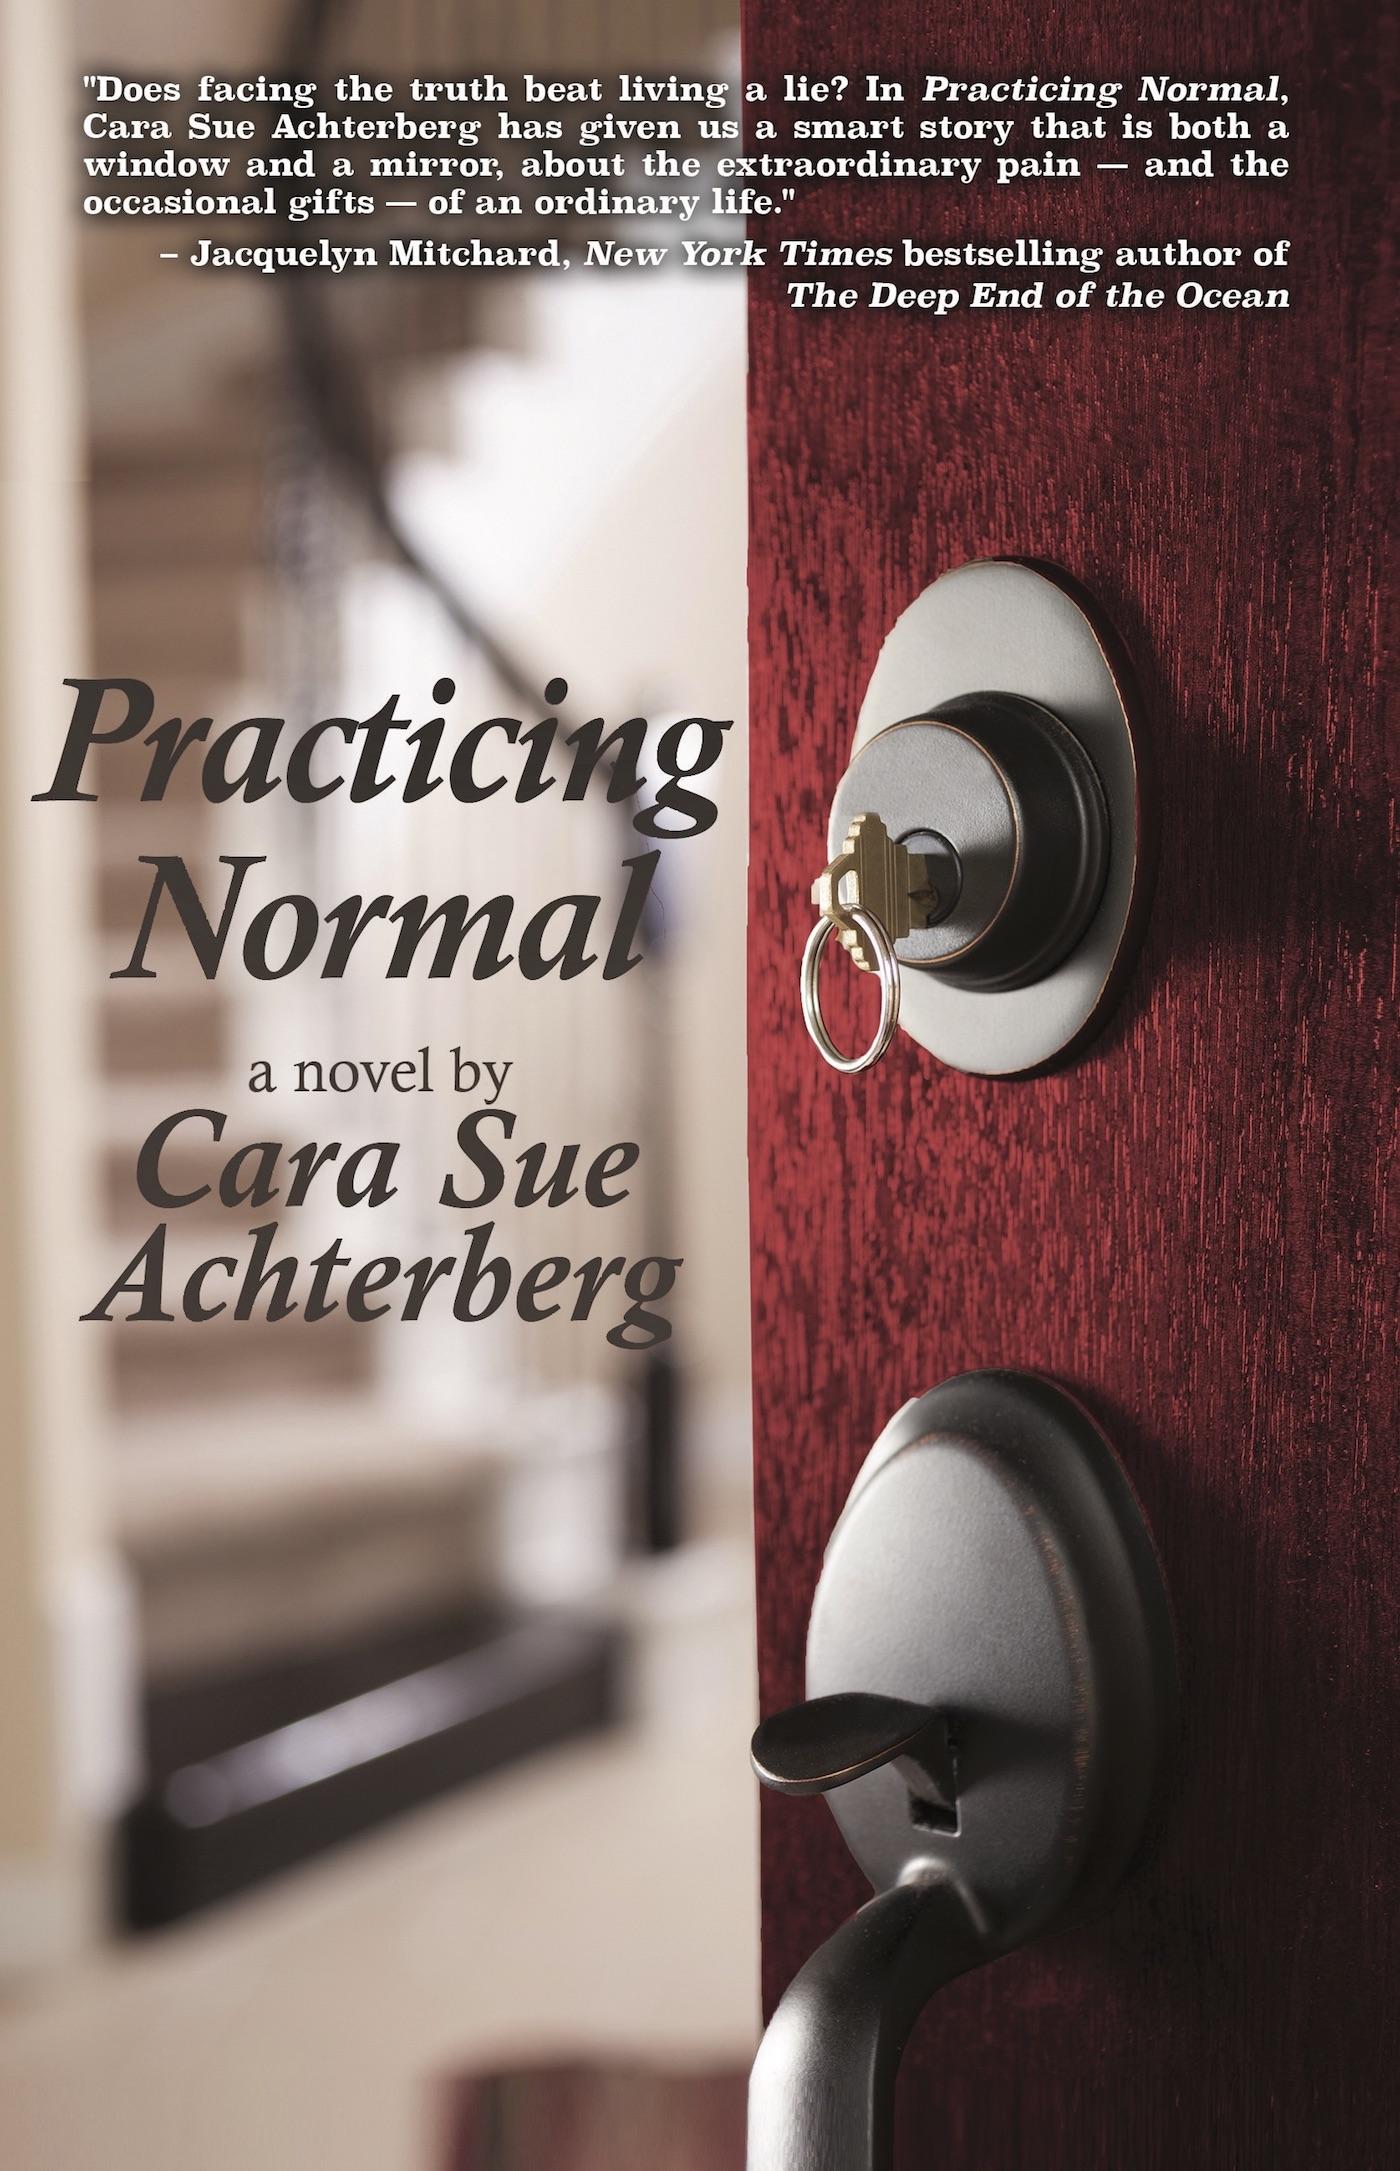 Practicing Normal by Cara Sue Achterberg